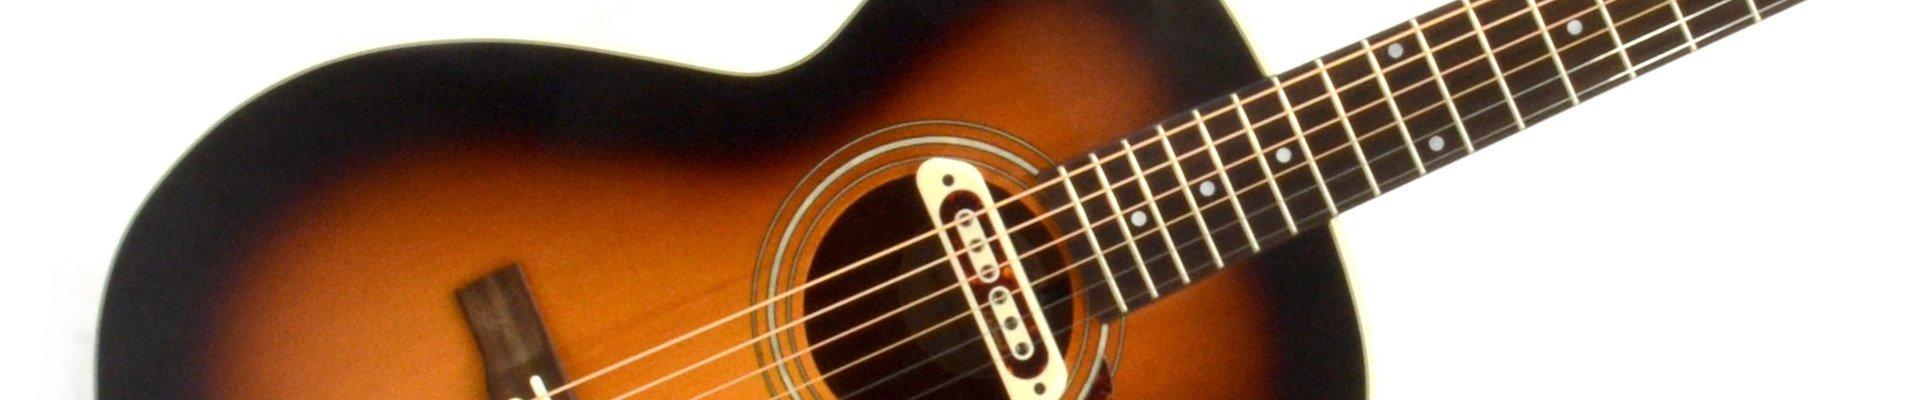 Guild Guitars Banner